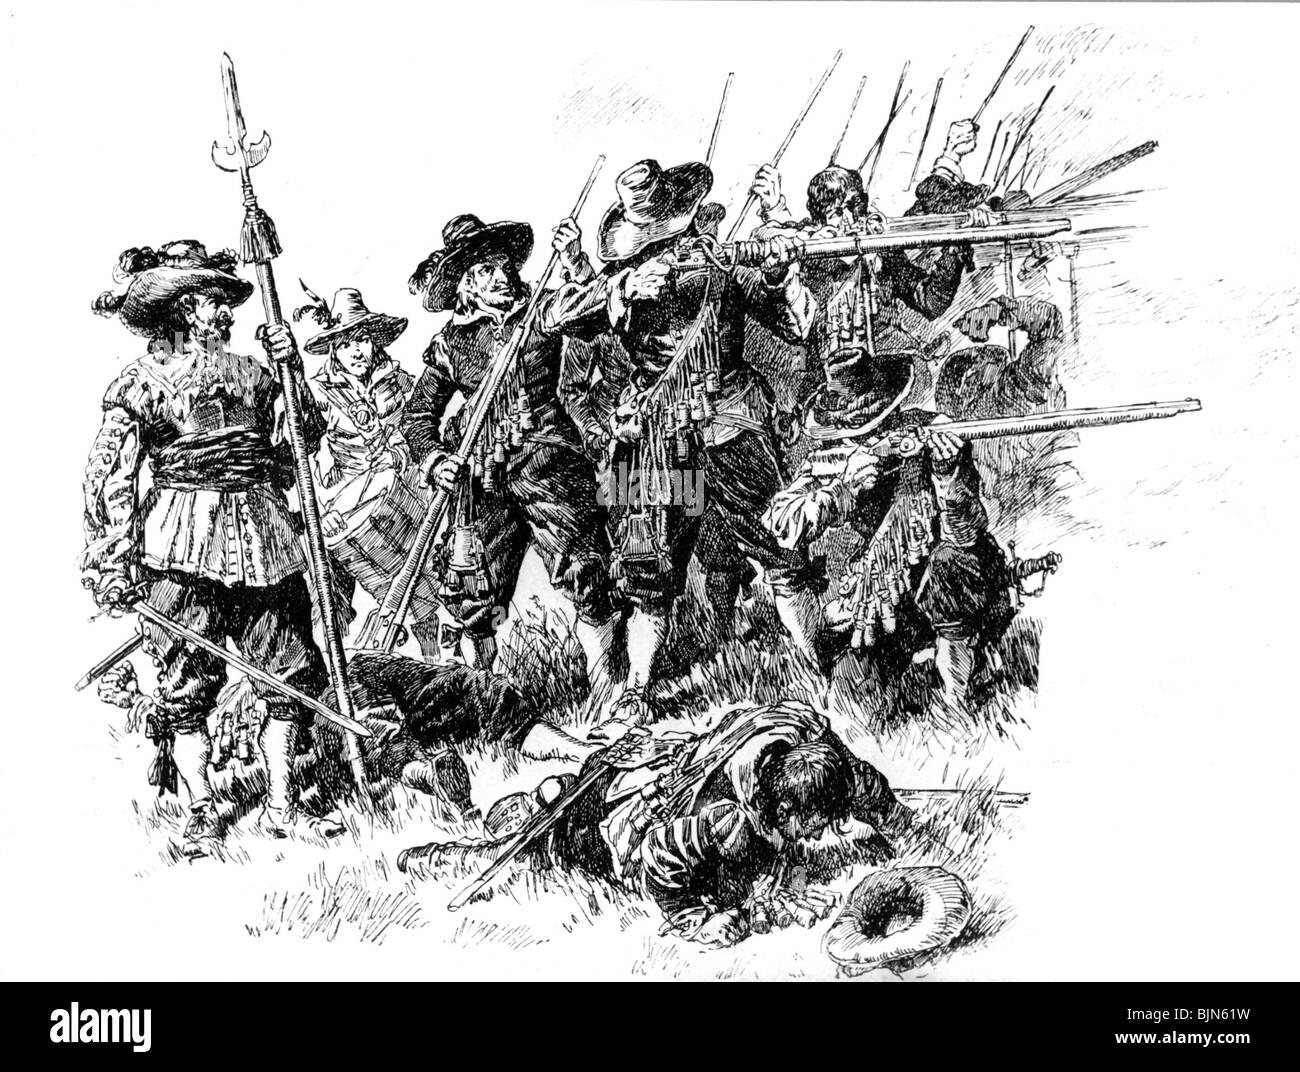 Military Musketeers Thirty Years War